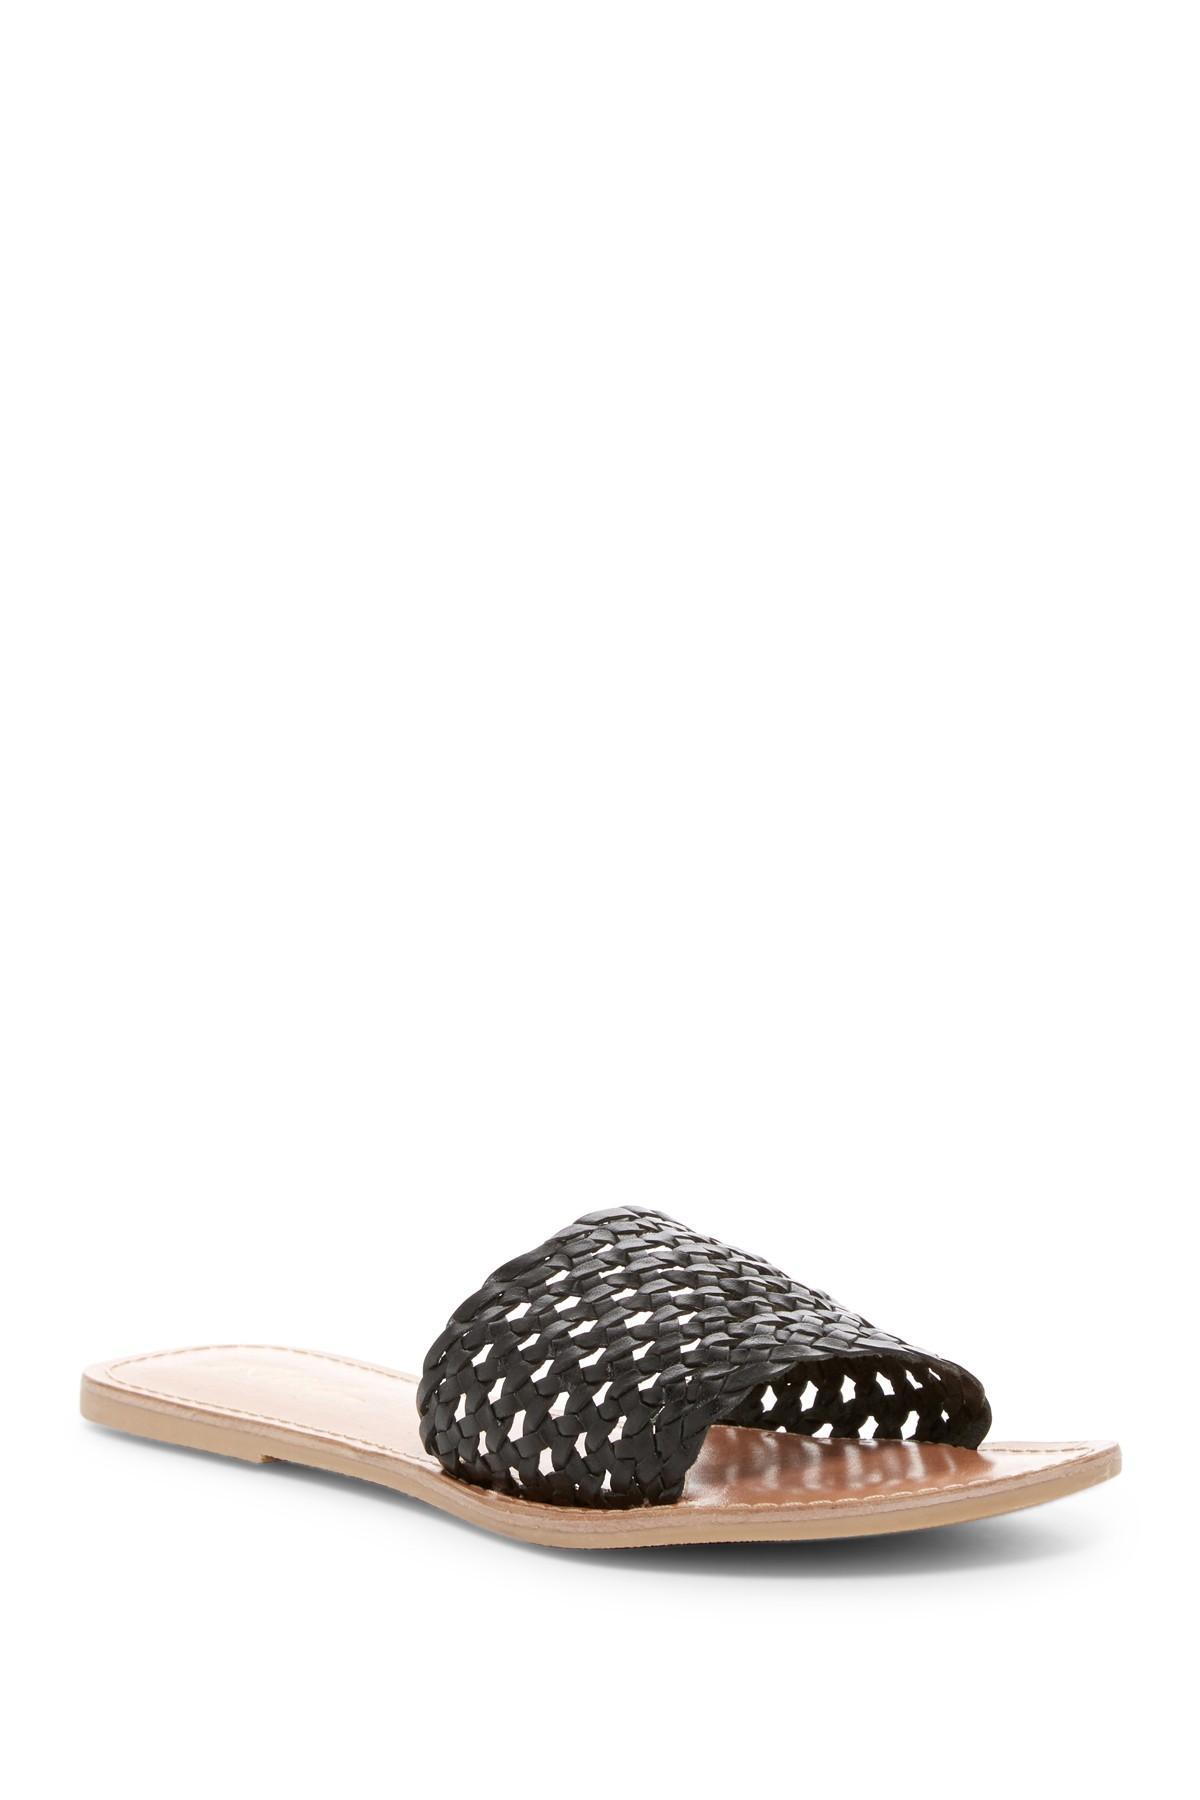 d7881c32dab8 Lyst - Rebels Bettina Leather Lattice Slide Sandal in Black